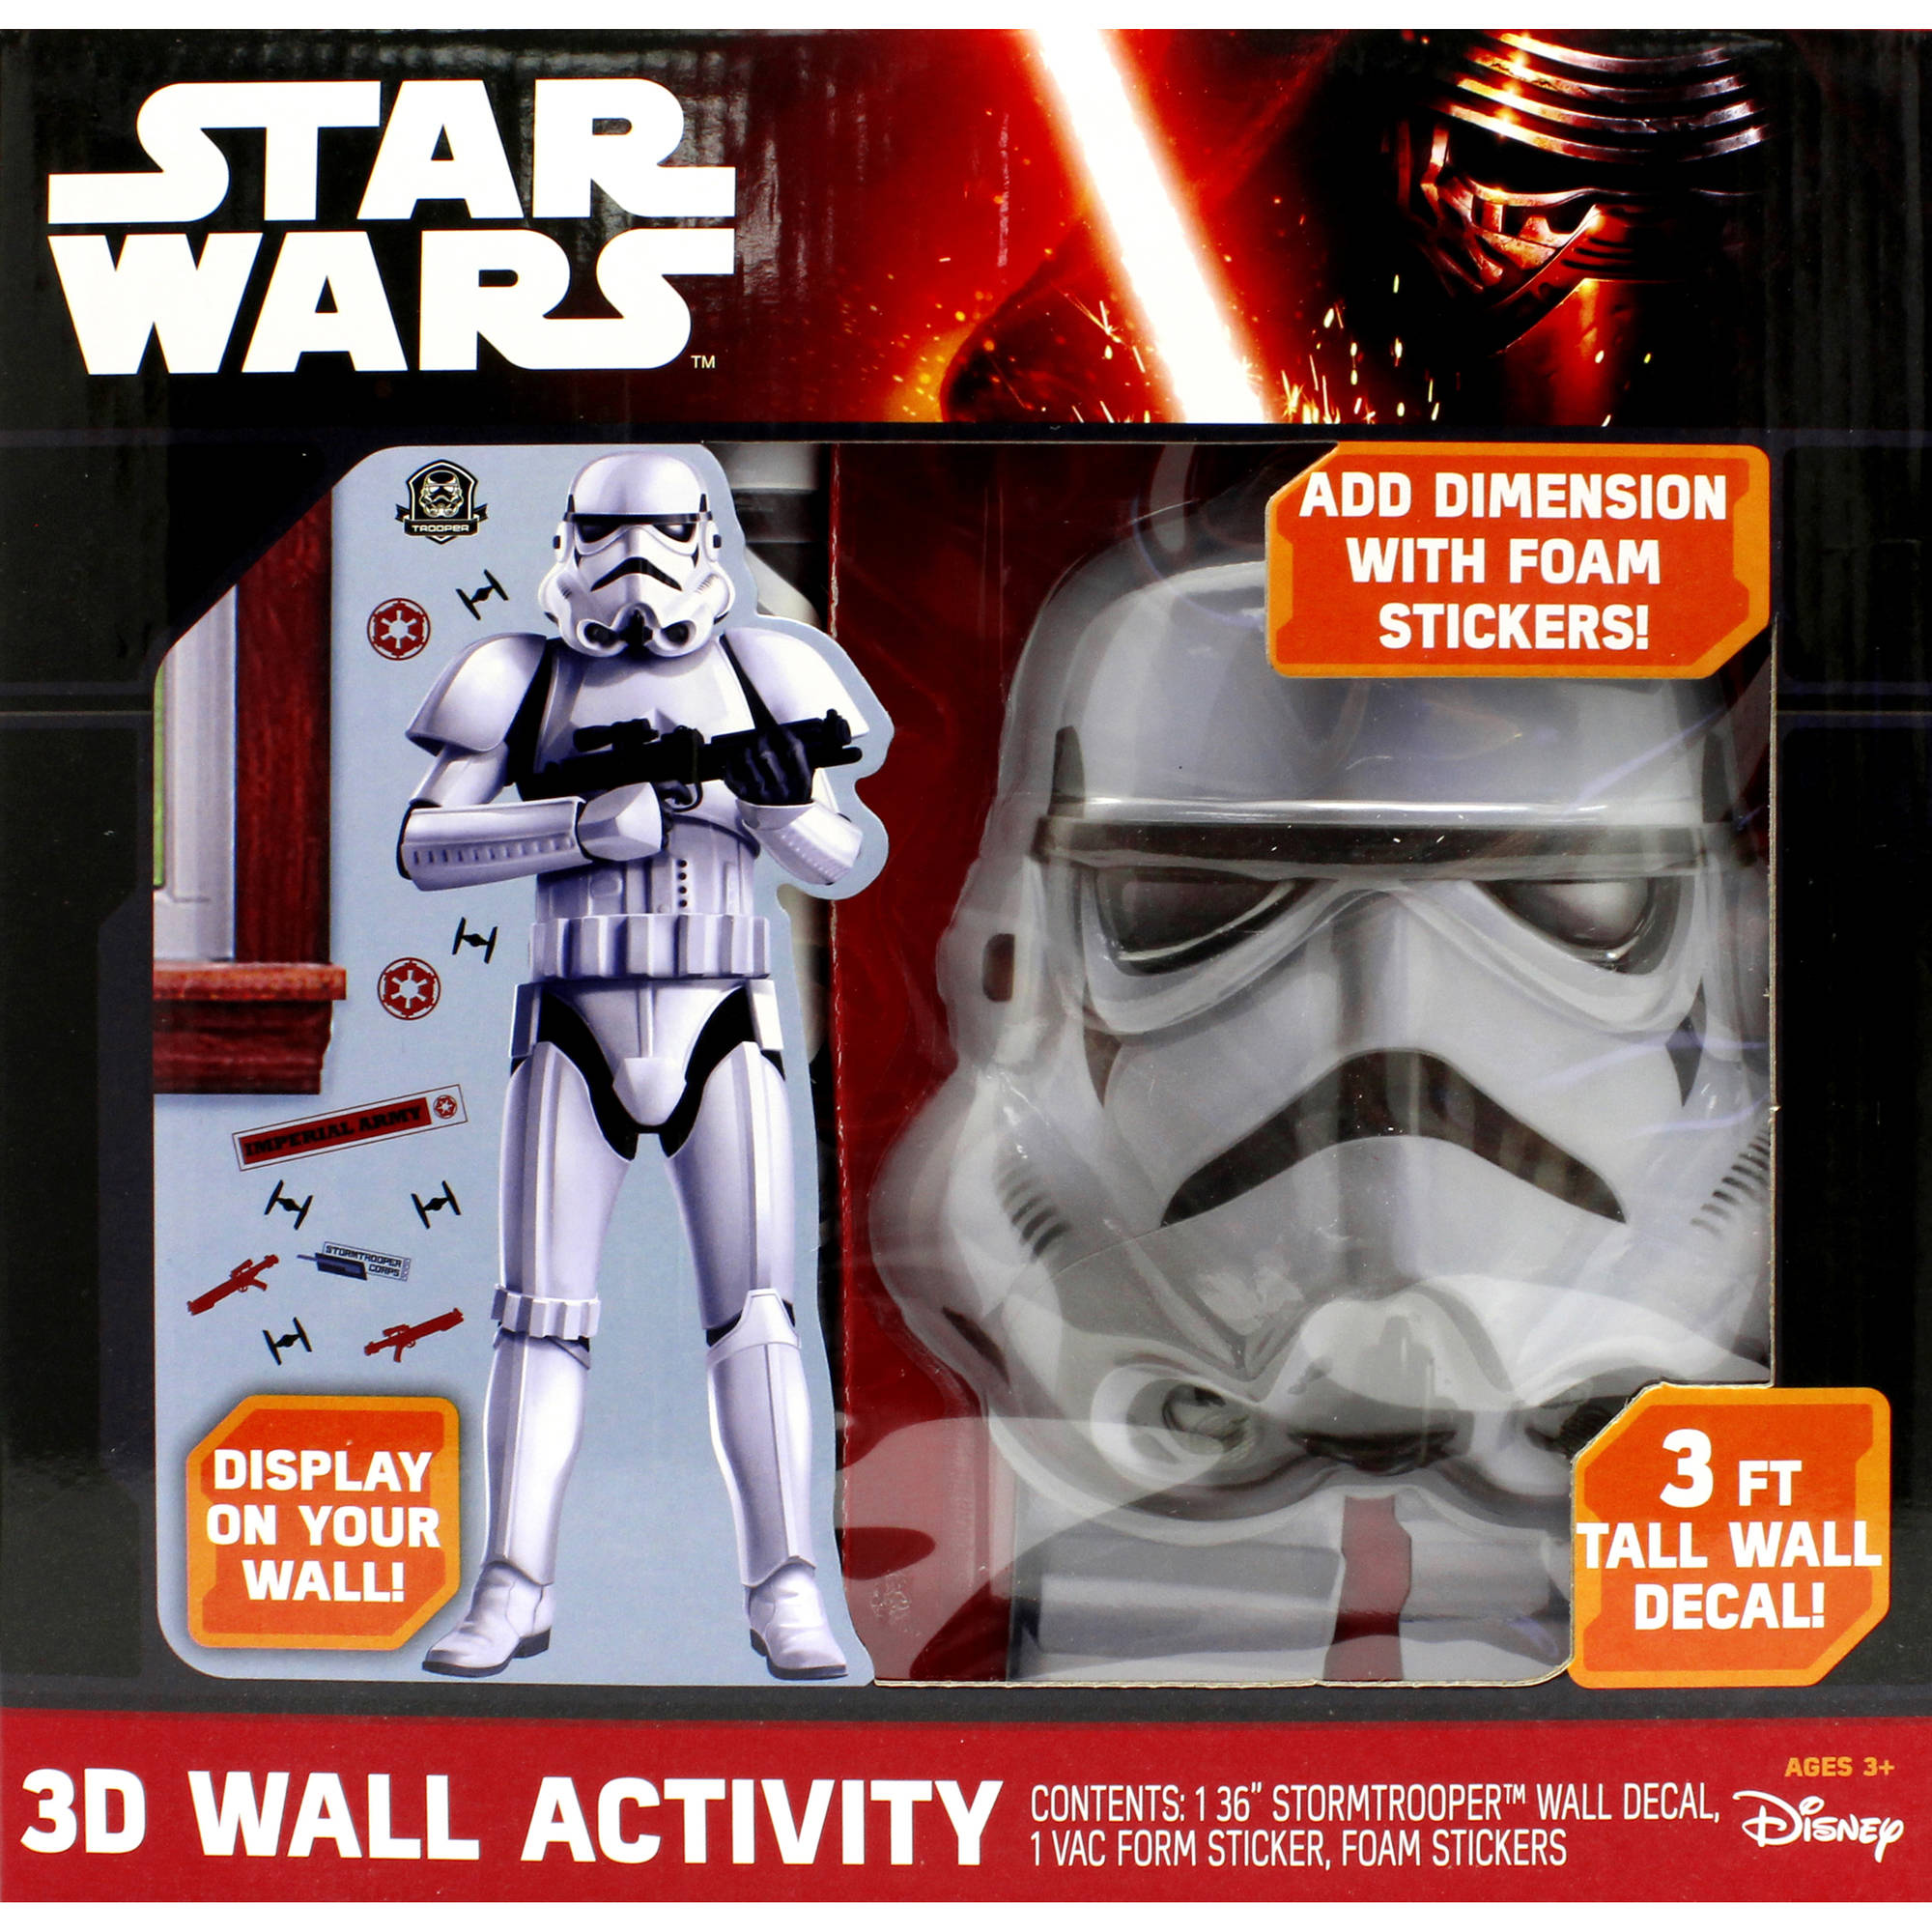 TFA 3D Wall Decal Activity Set 1